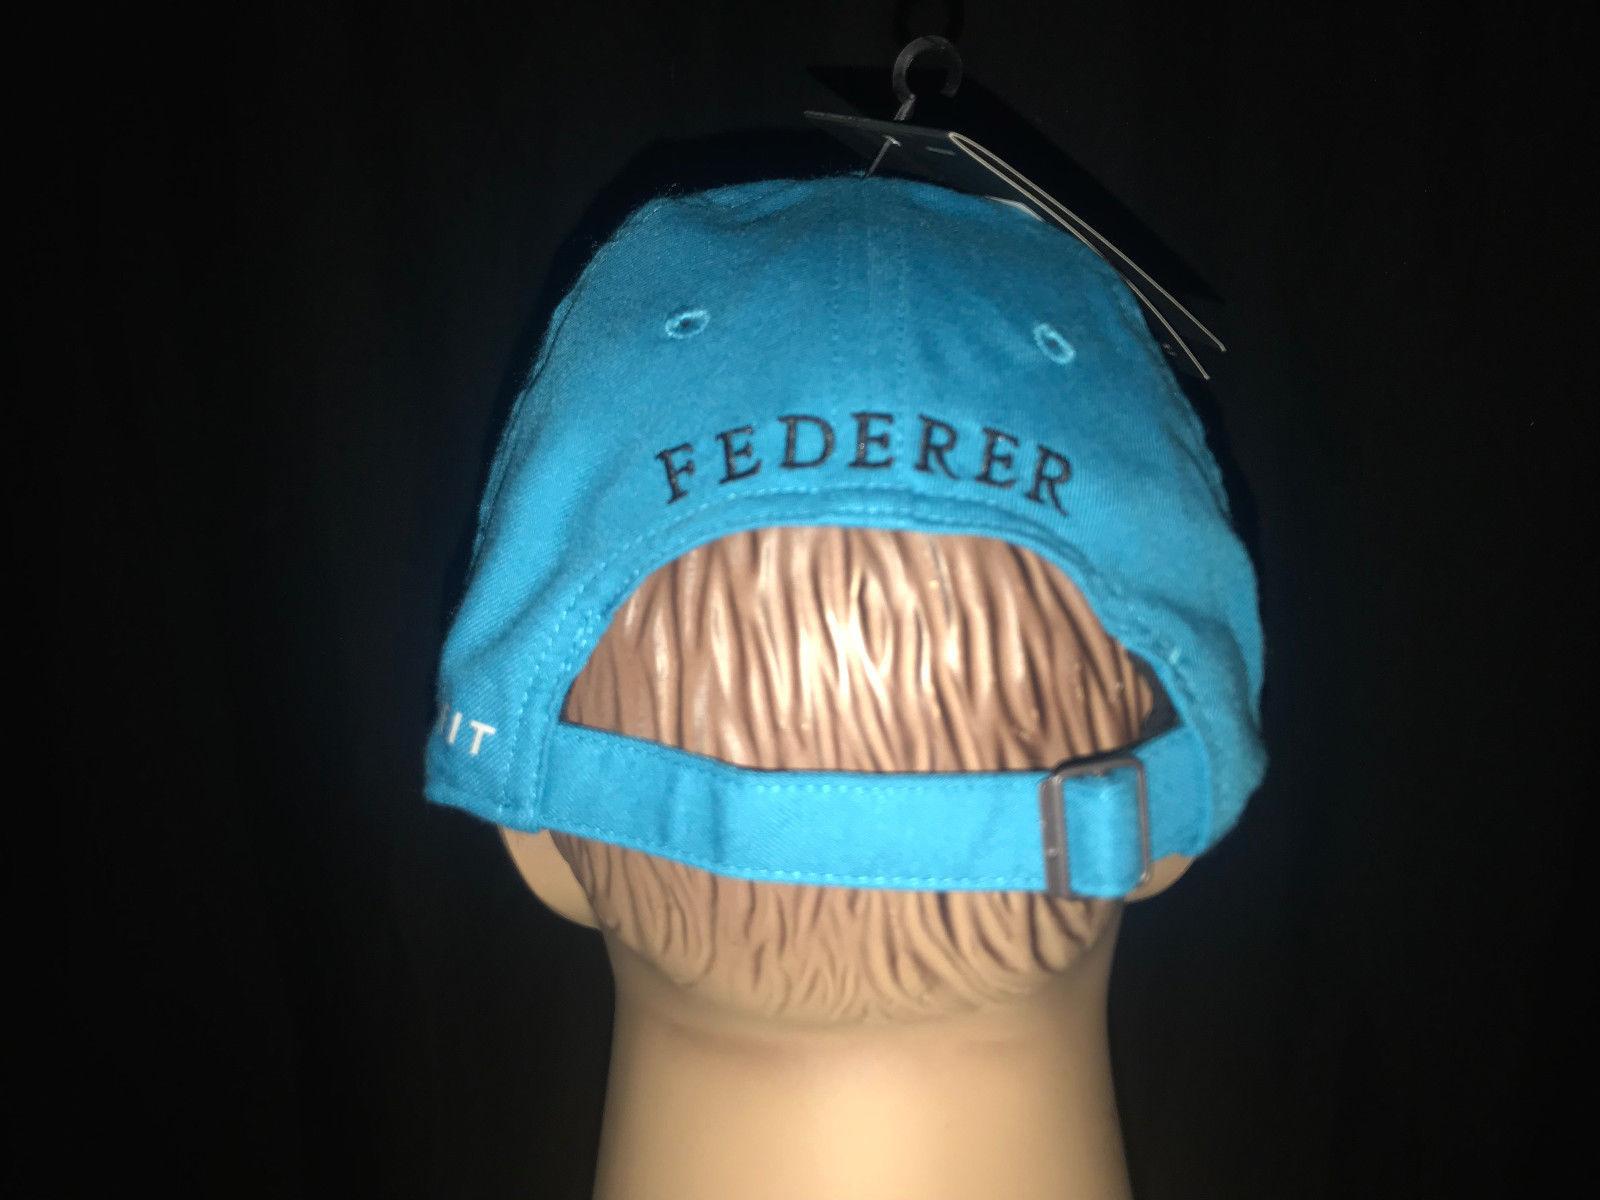 Nike RF Roger Federer Tennis Dri-fit Hat Cap Neo Turquoise